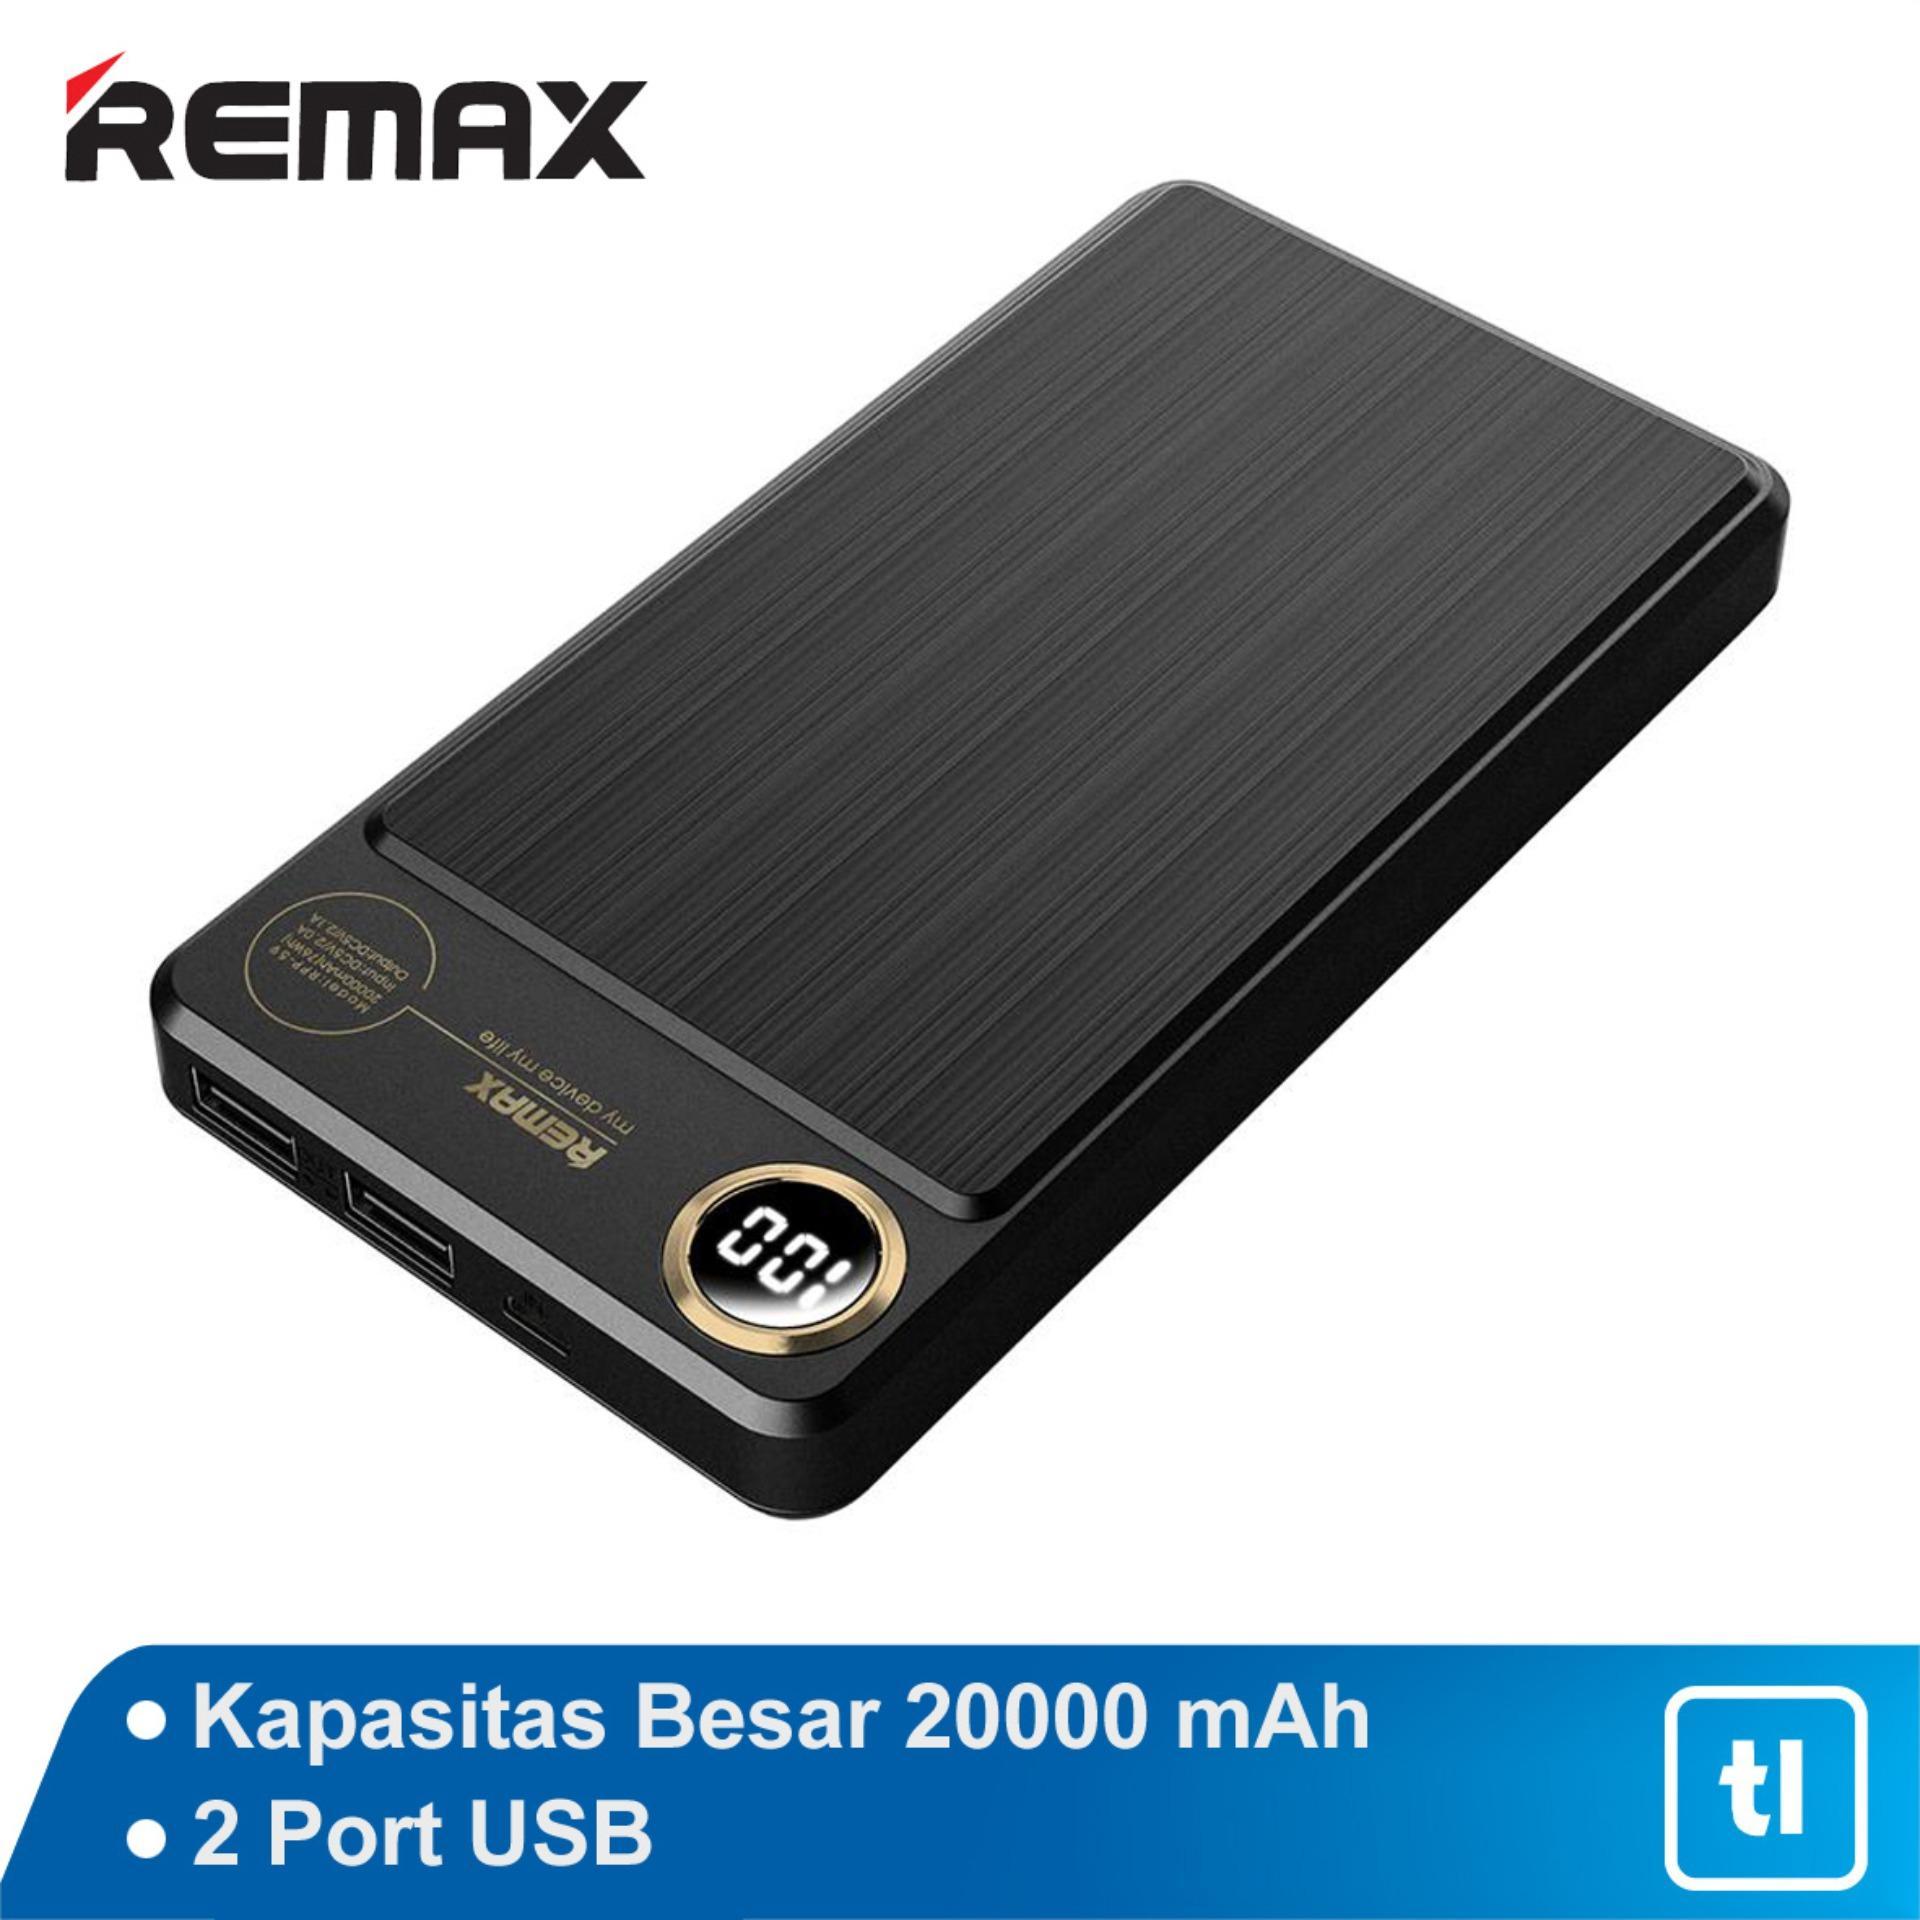 Powerbank Remax Kooker 20000 MAH Dual RPP-59 Real Capacity Original Garansi / Power bank Original / Powerbank Garansi / Powerbank Murah / Powerbank Bagus /Powerbank Awet